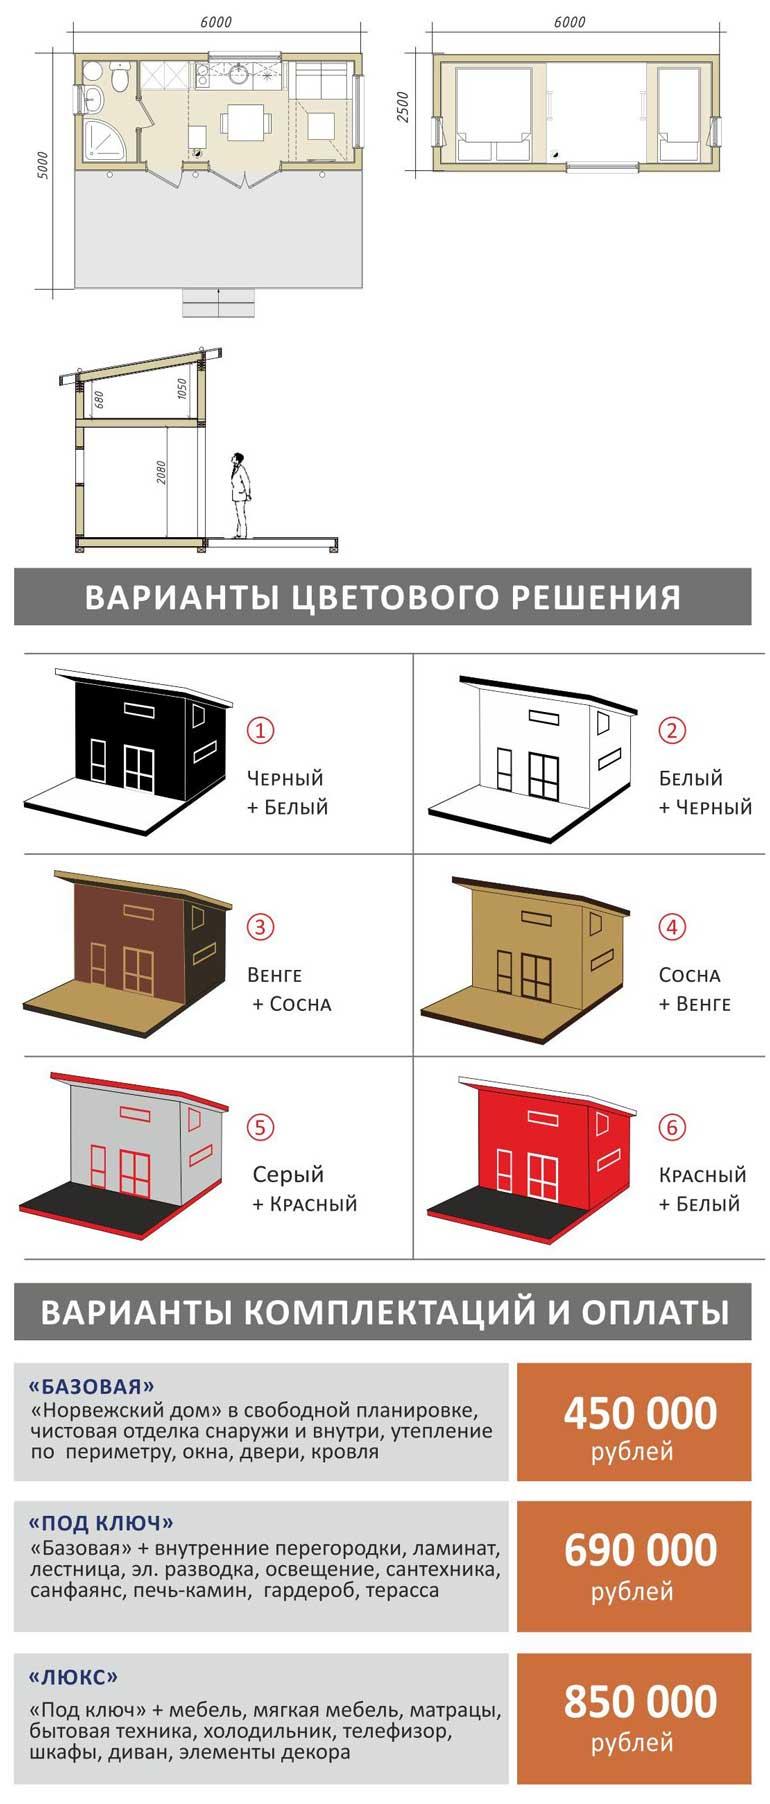 norvezhskiy-dom-21-smart-montazh-za-1-den